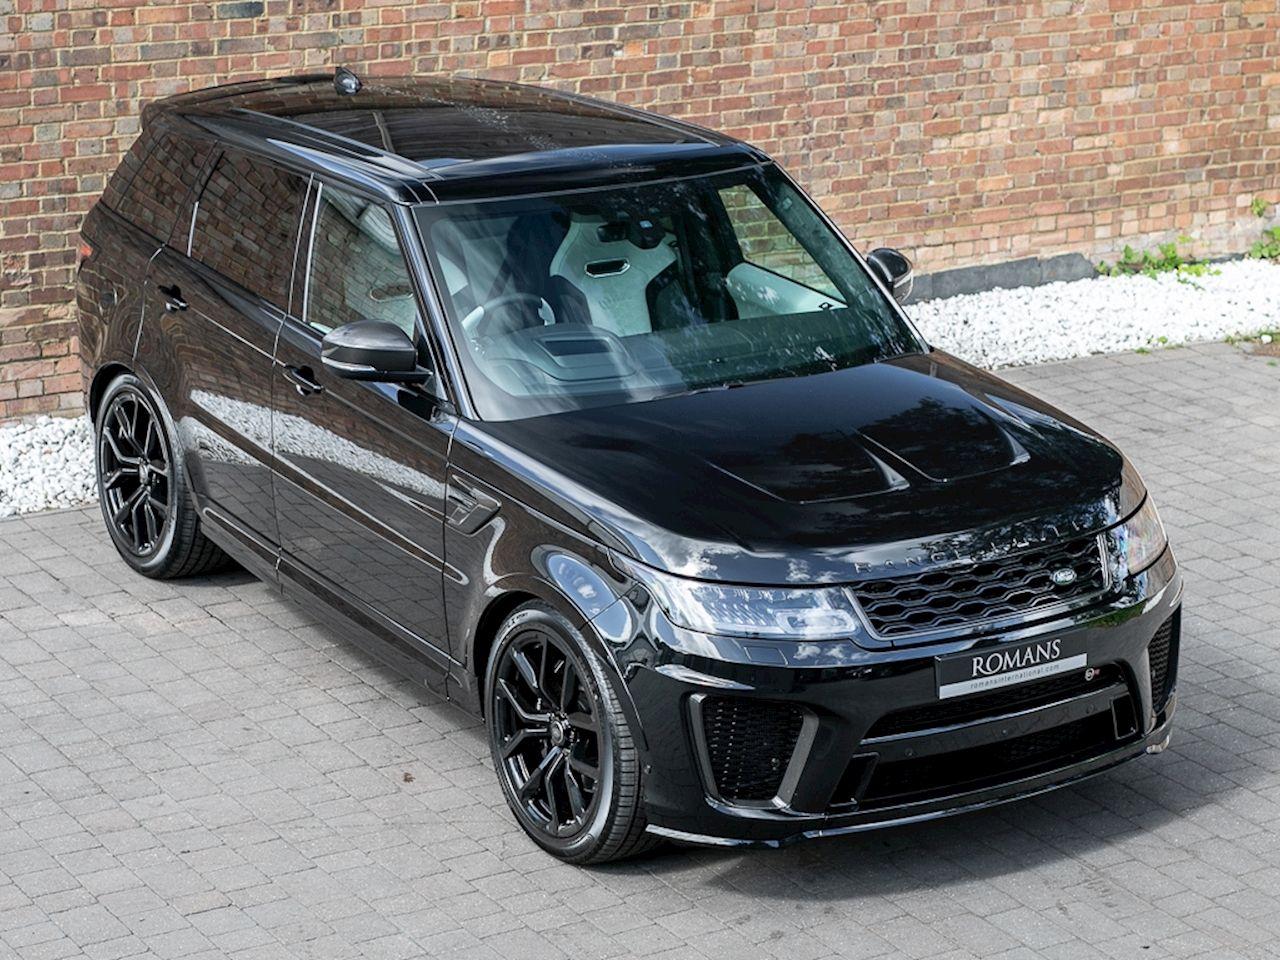 2018 Used Land Rover Range Rover Sport Svr Santorini Black Range Rover Sport Range Rover Sport Black Luxury Cars Range Rover